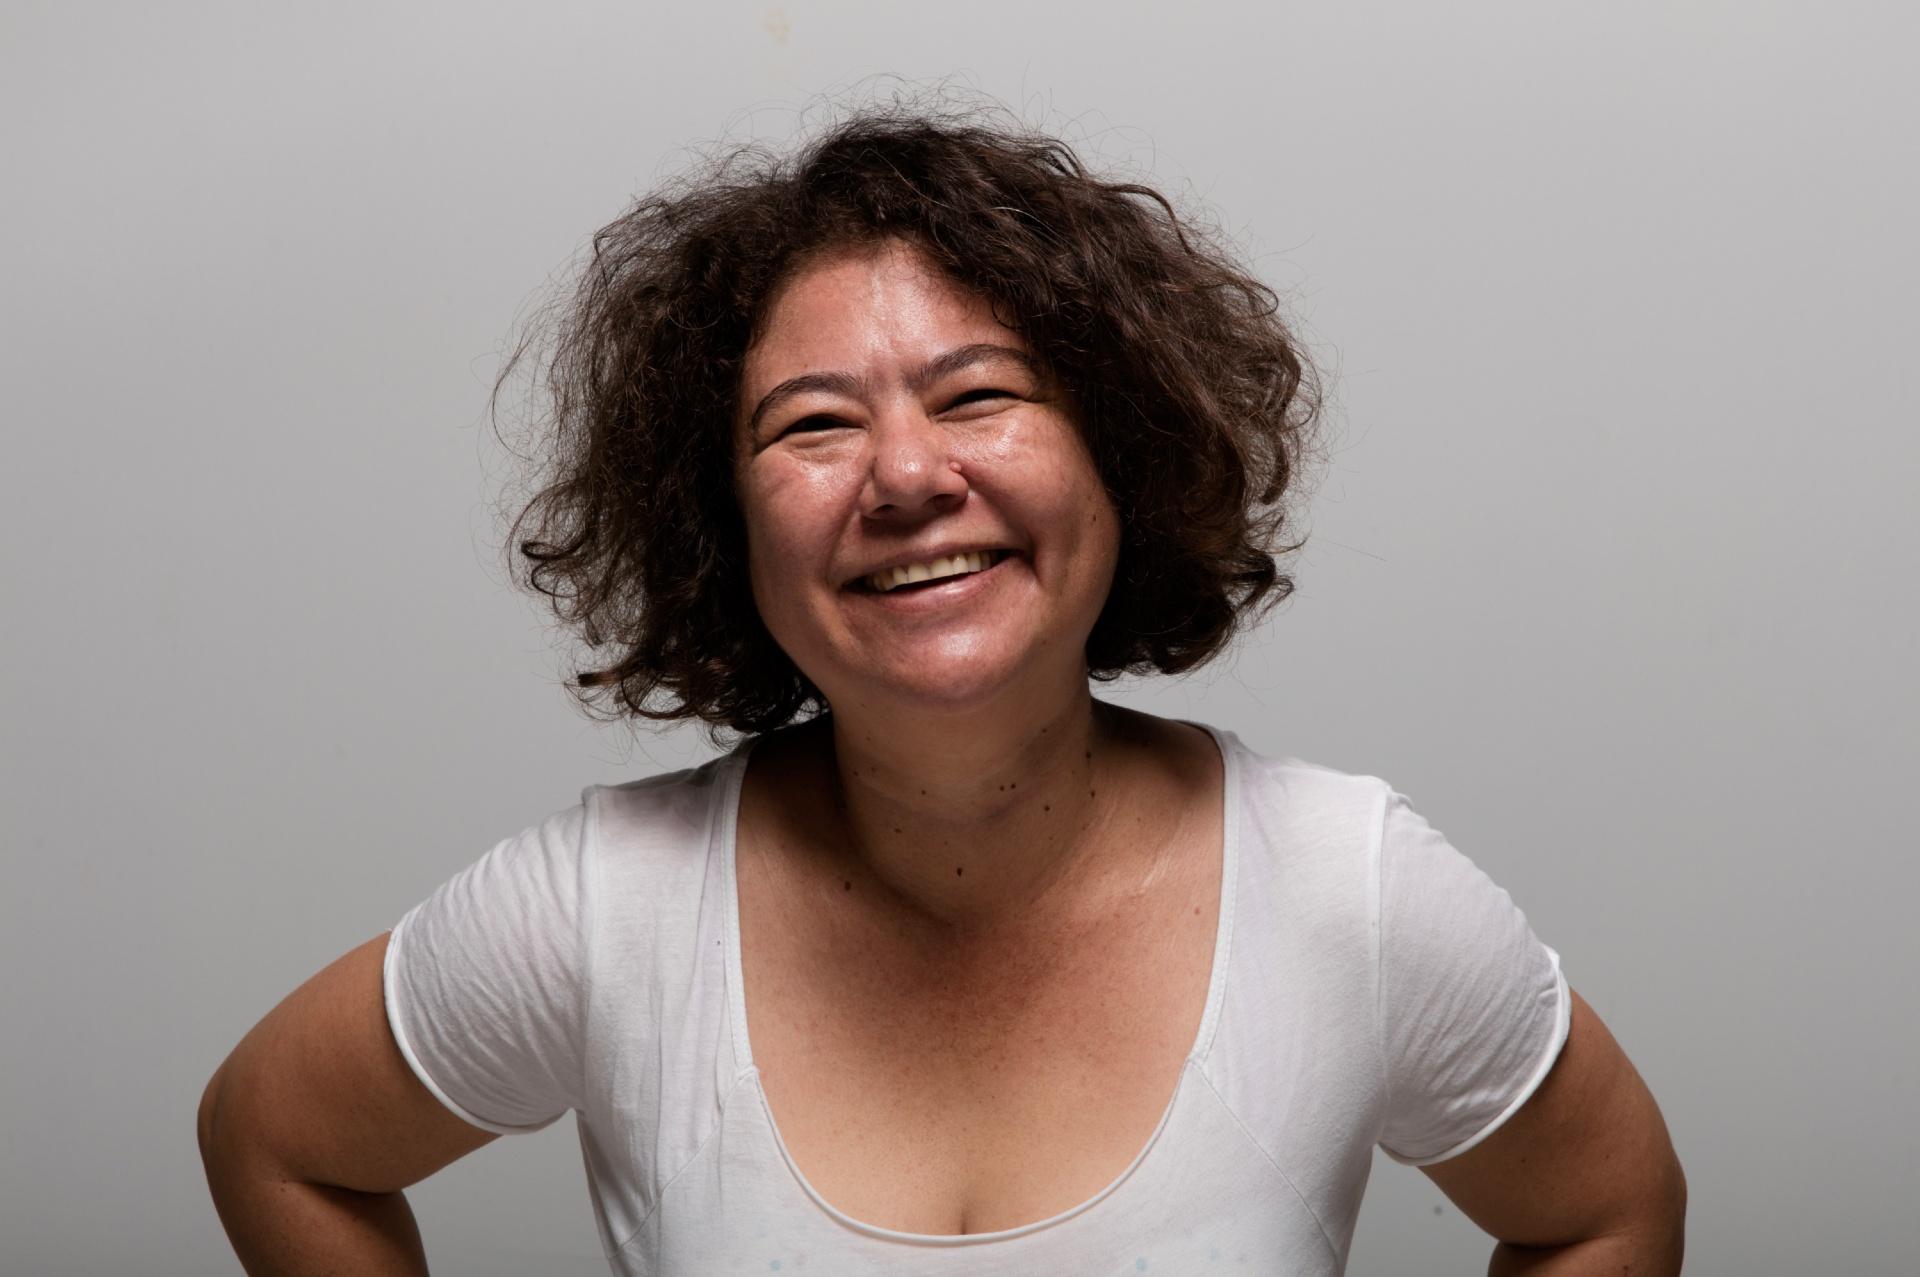 portrait photo of a woman in white t-shirt, I-Lann Yee